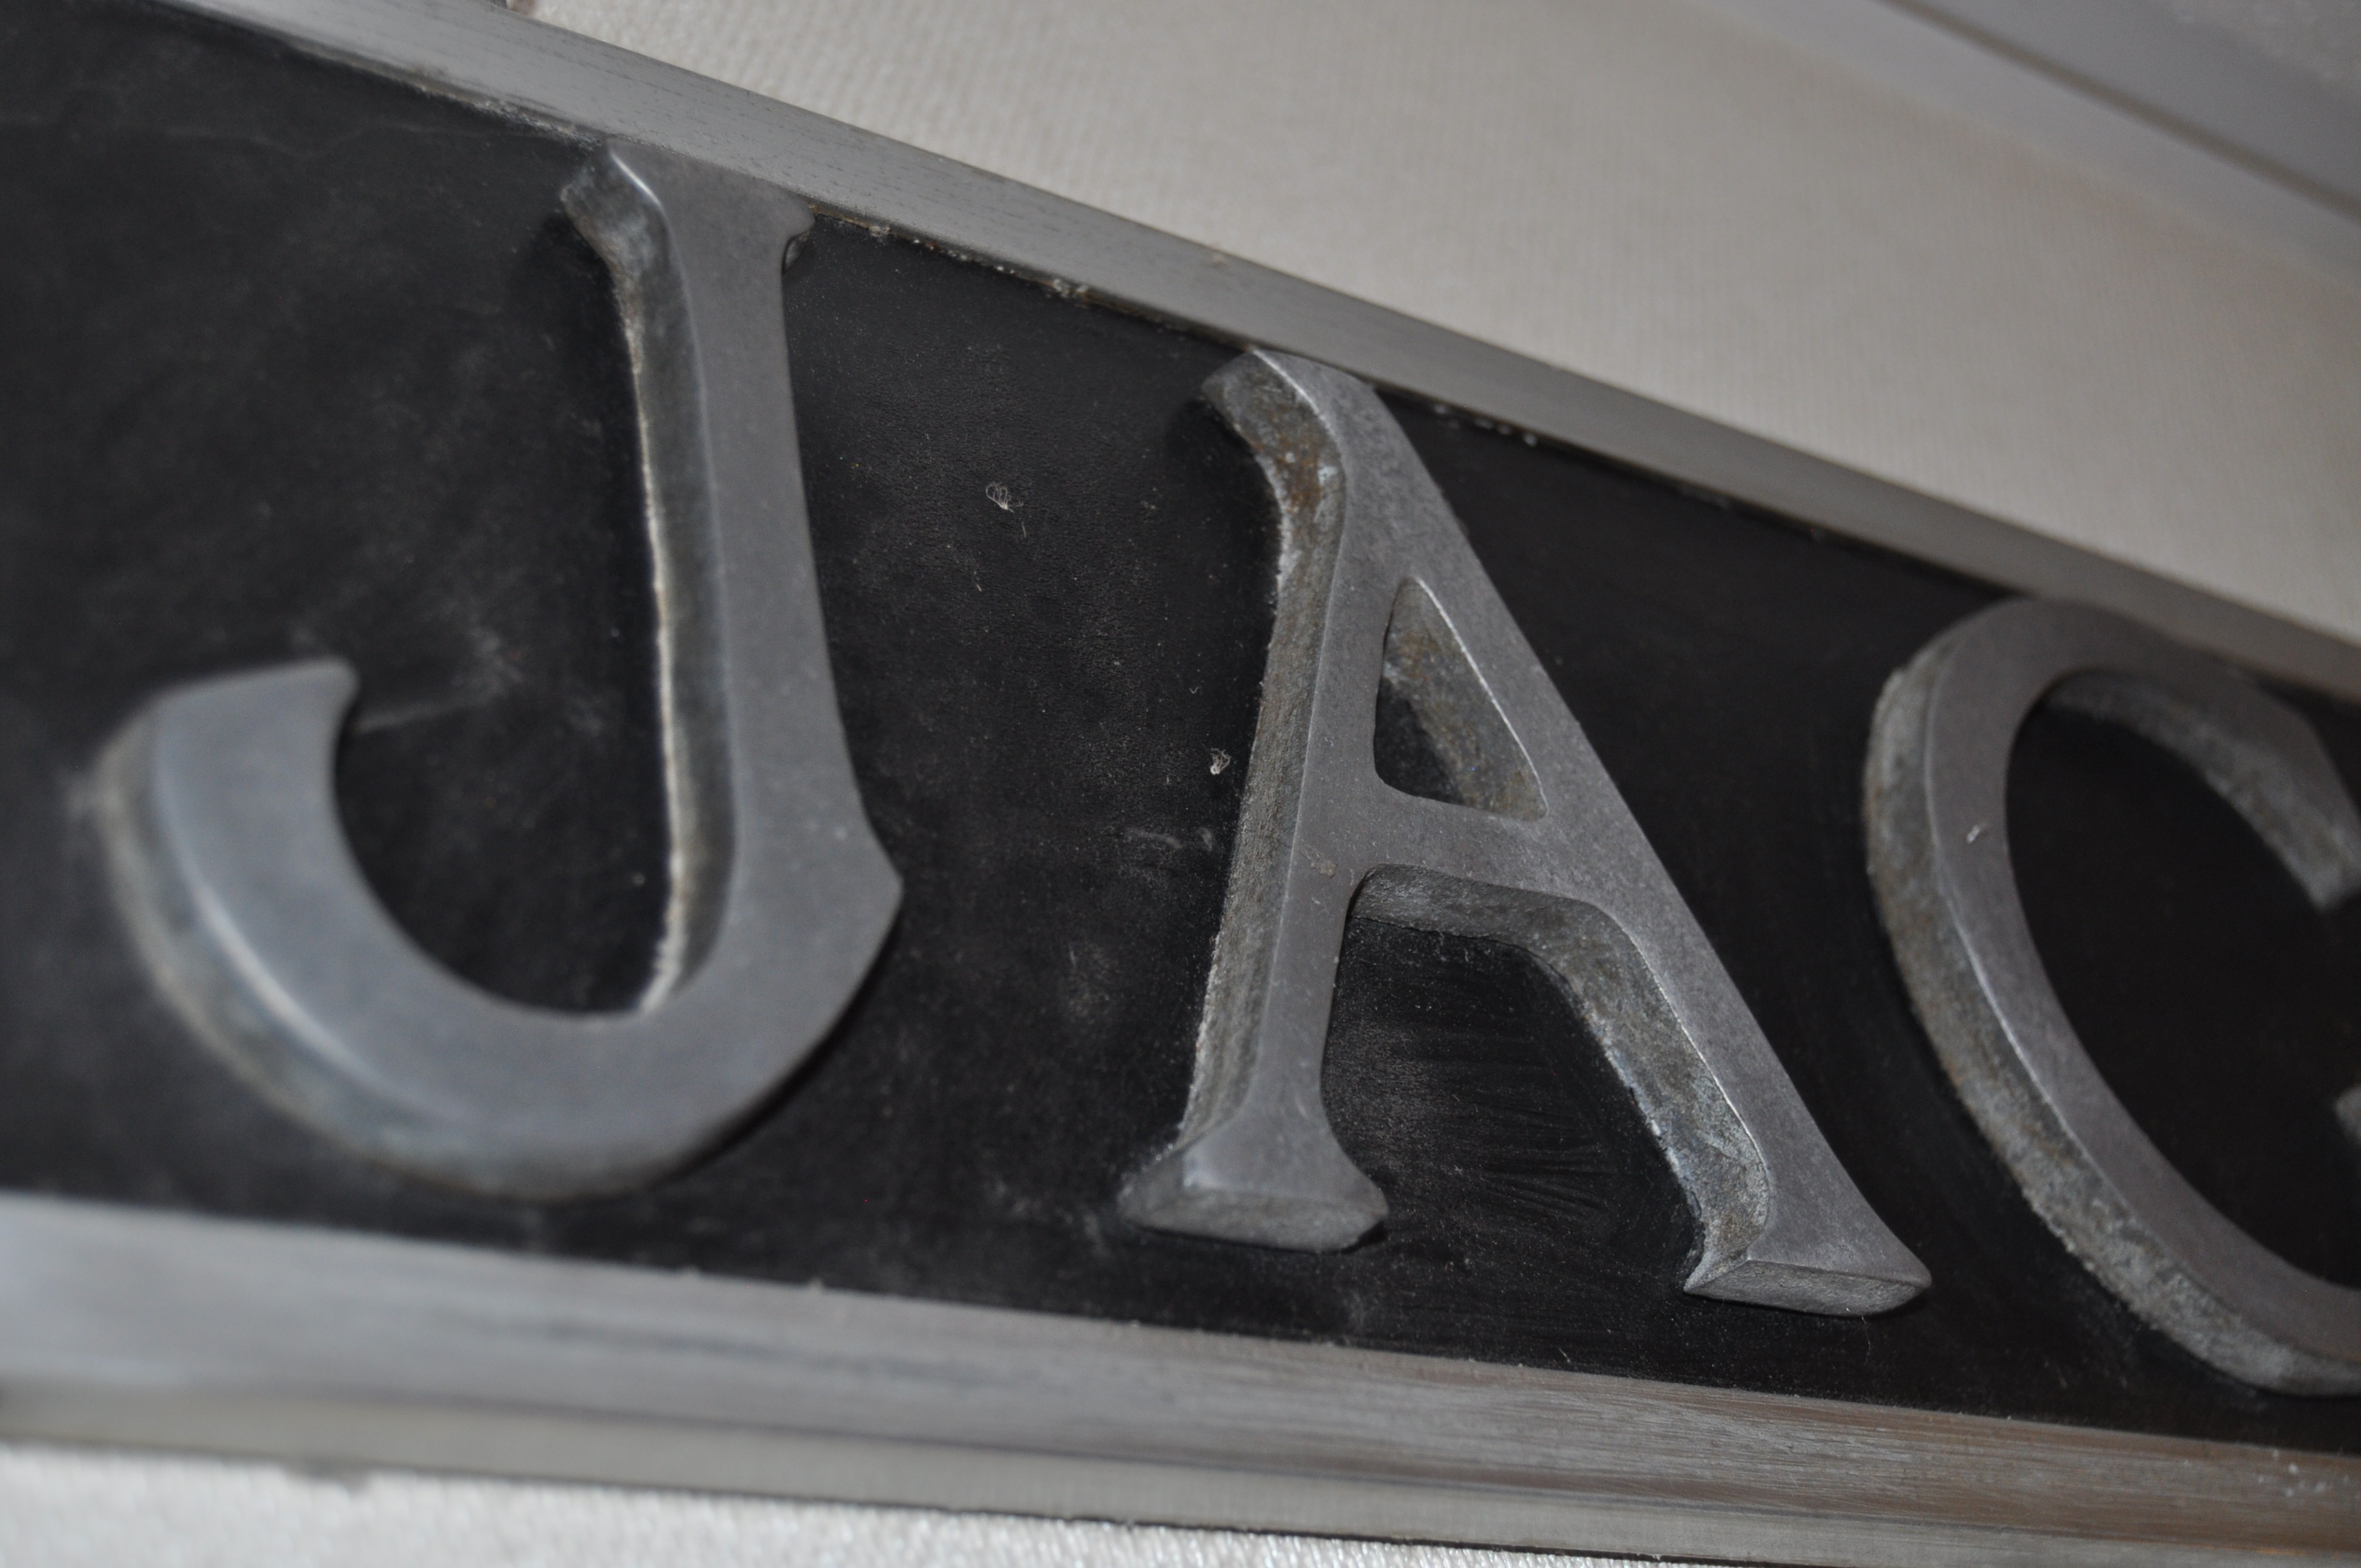 JAGUAR - RARE 1930S DEALERSHIP SHOWROOM ADVERTISING SIGN - Image 2 of 4